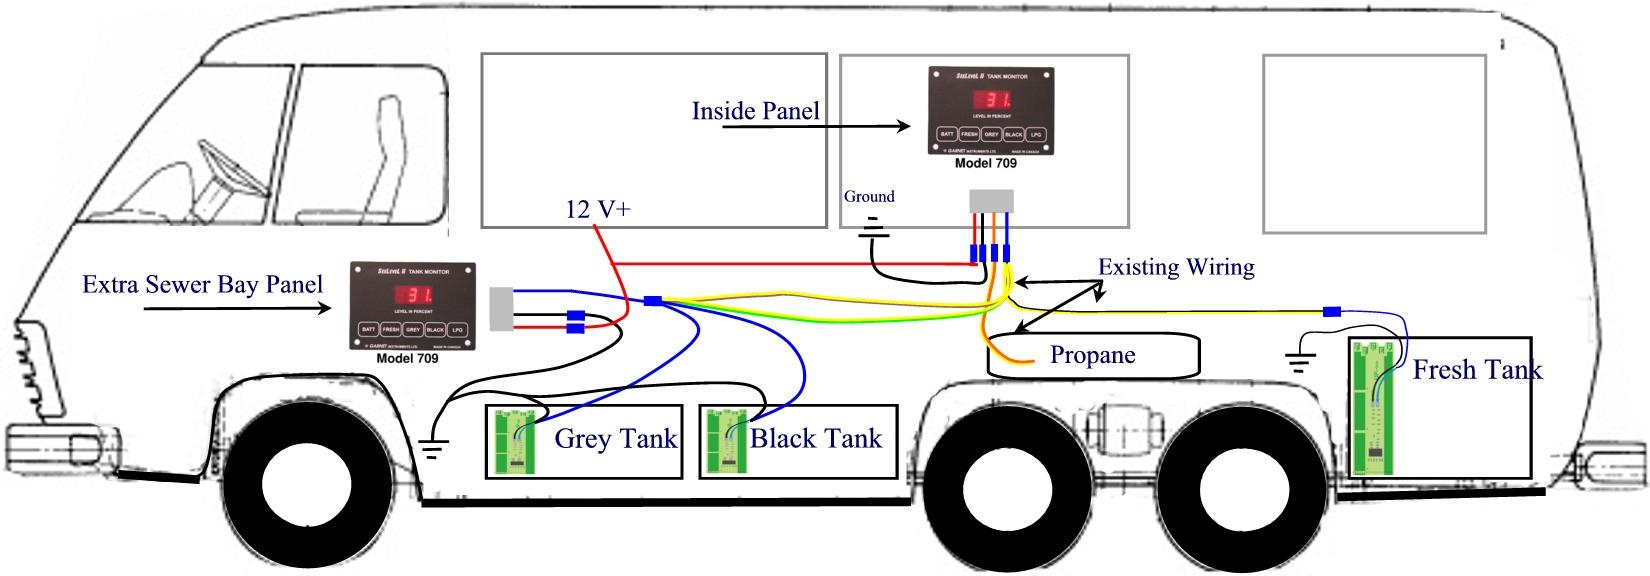 kib monitor panel systems. Black Bedroom Furniture Sets. Home Design Ideas